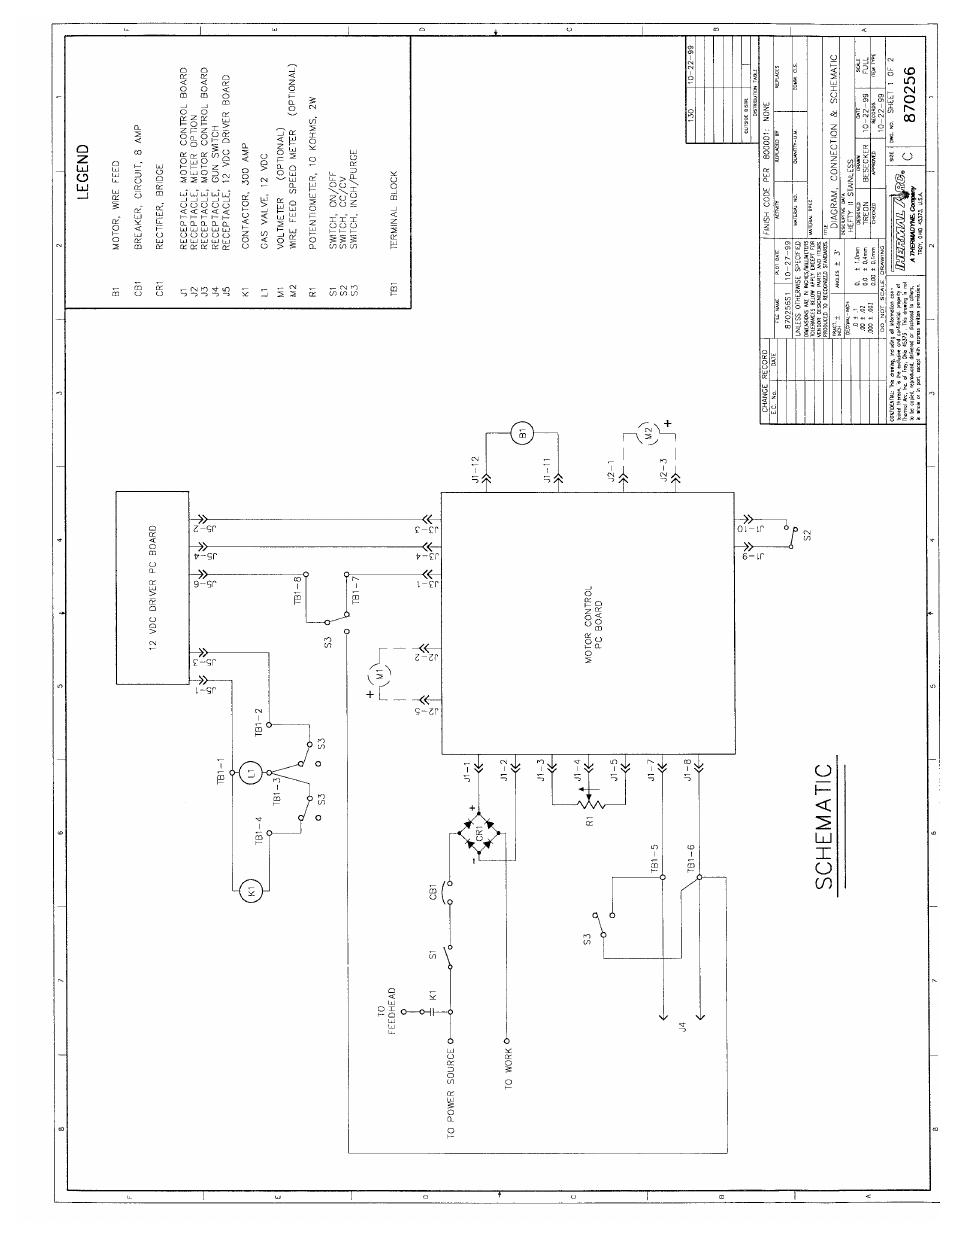 Tweco Hefty II CC CV Voltage Sensing Wire feeder User